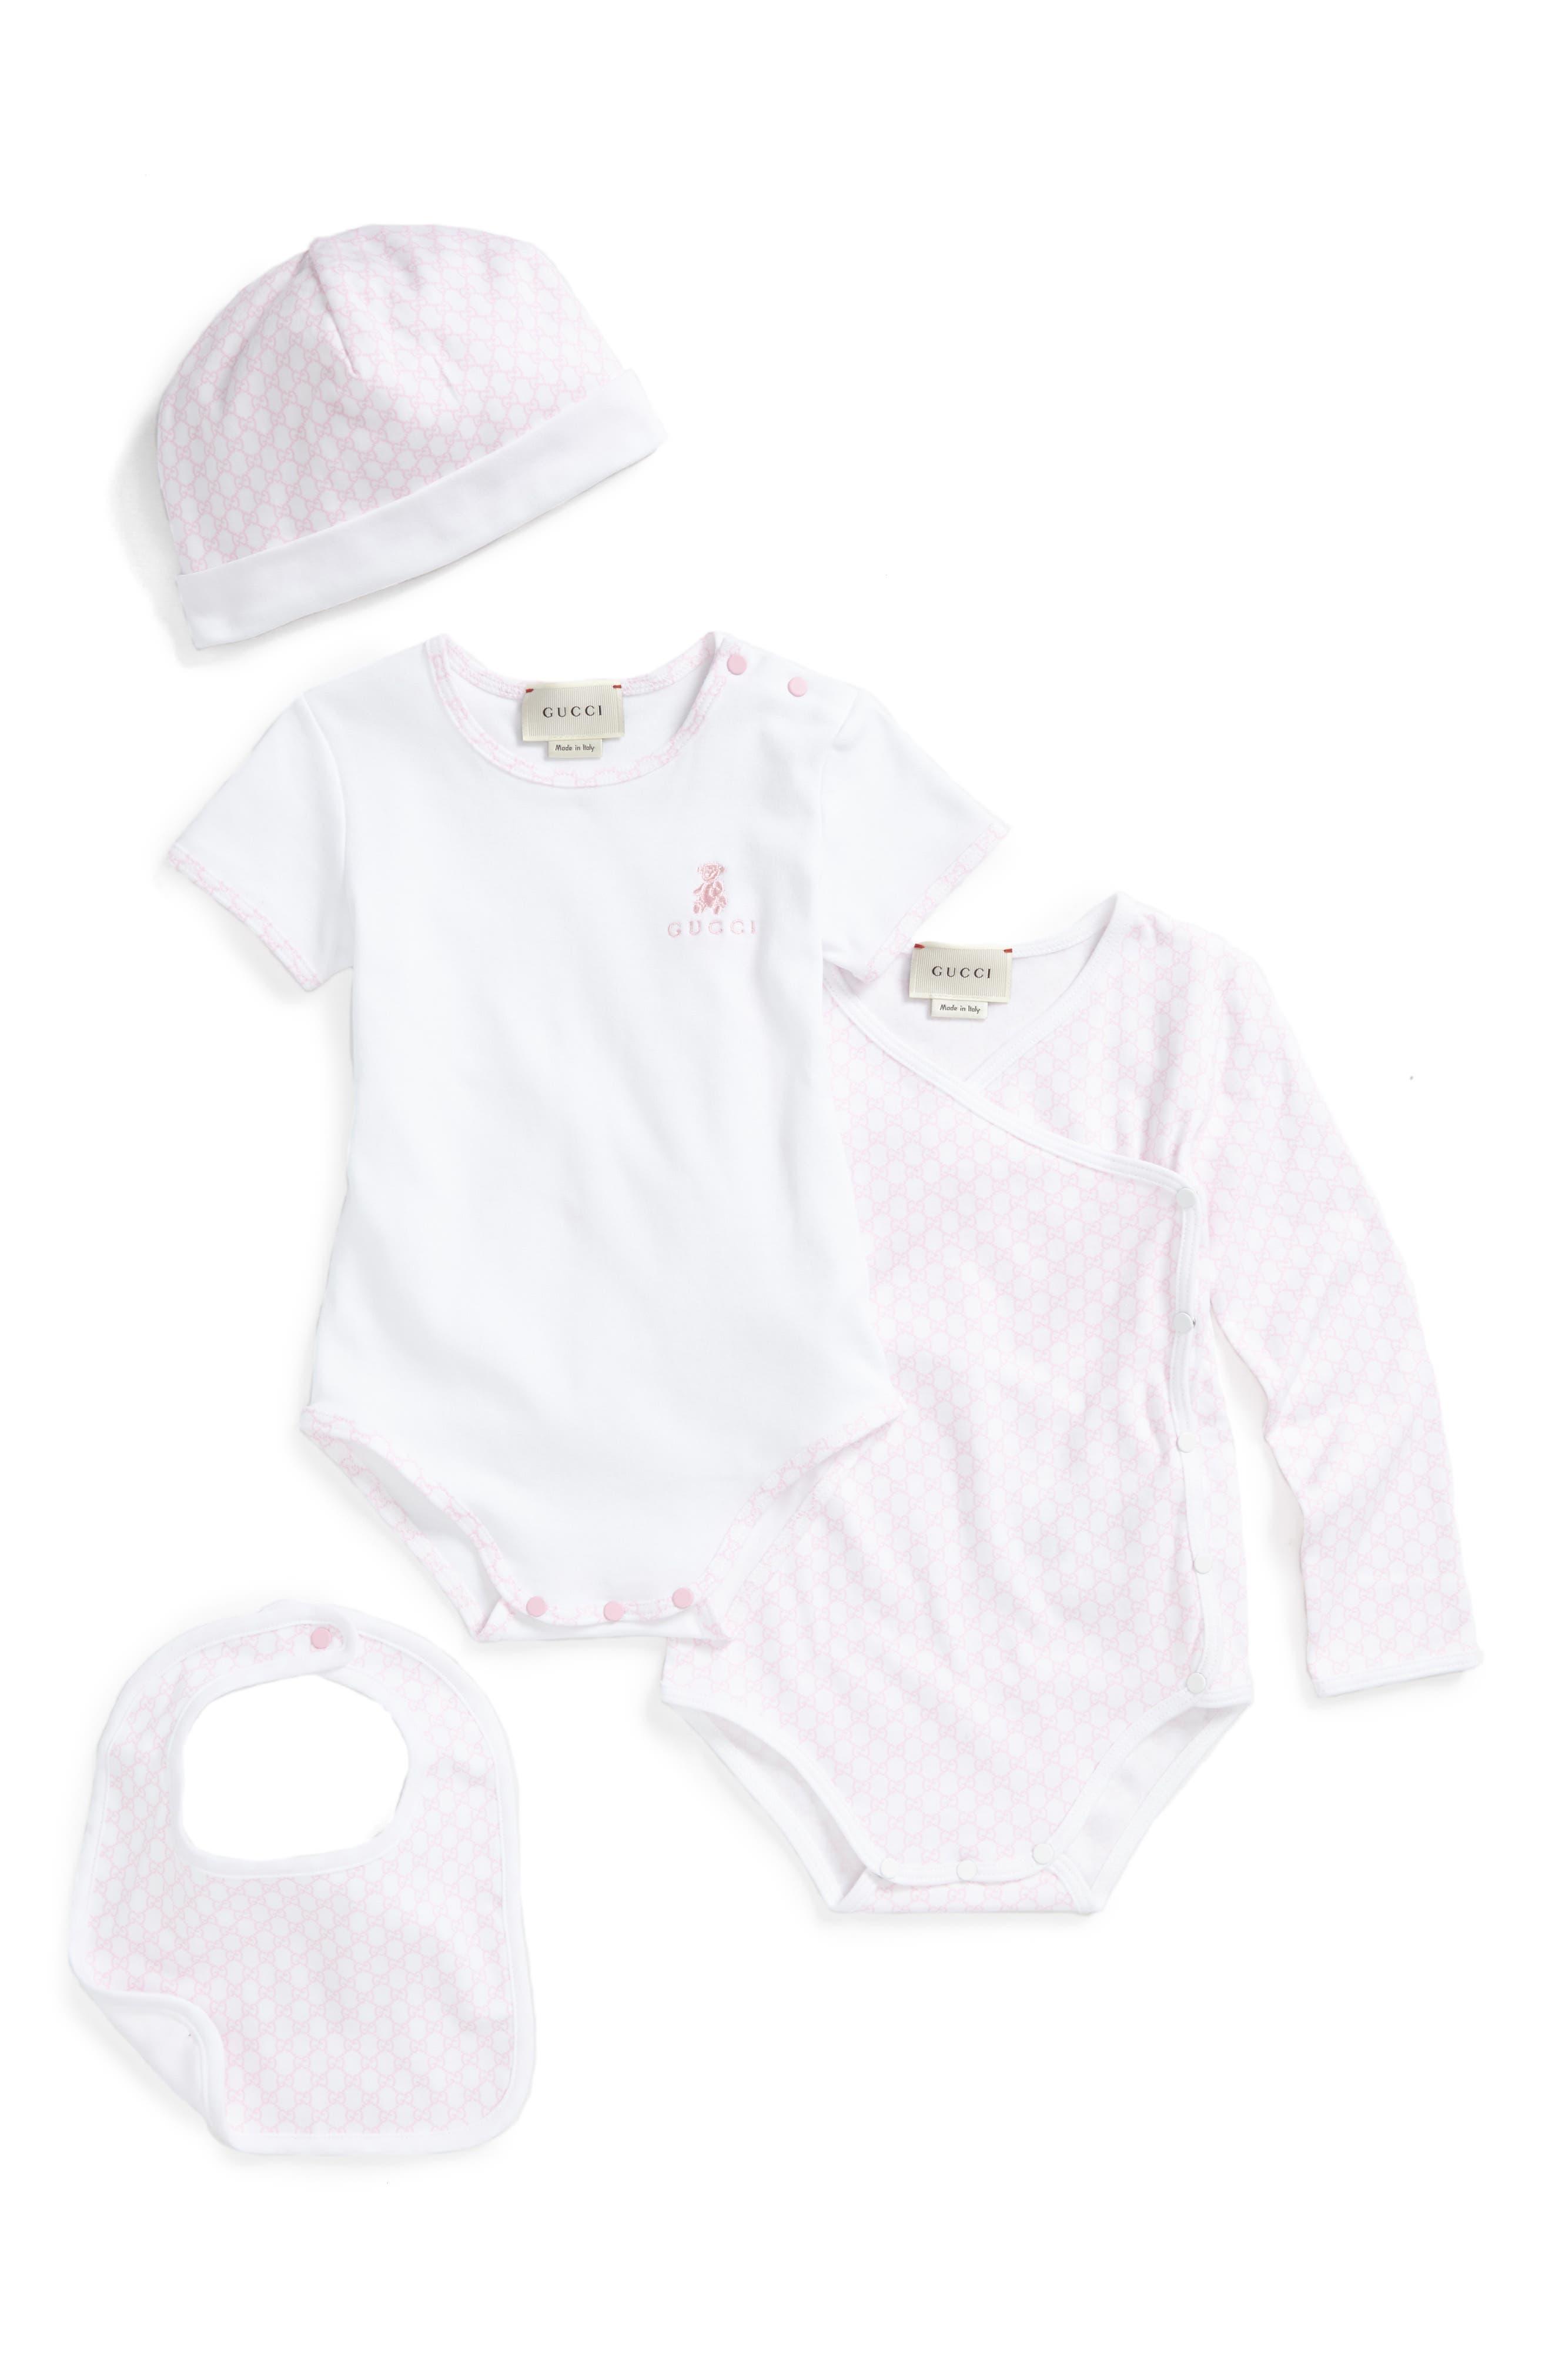 Short Sleeve Bodysuit, Long Sleeve Bodysuit, Hat & Bib Set,                             Main thumbnail 1, color,                             422